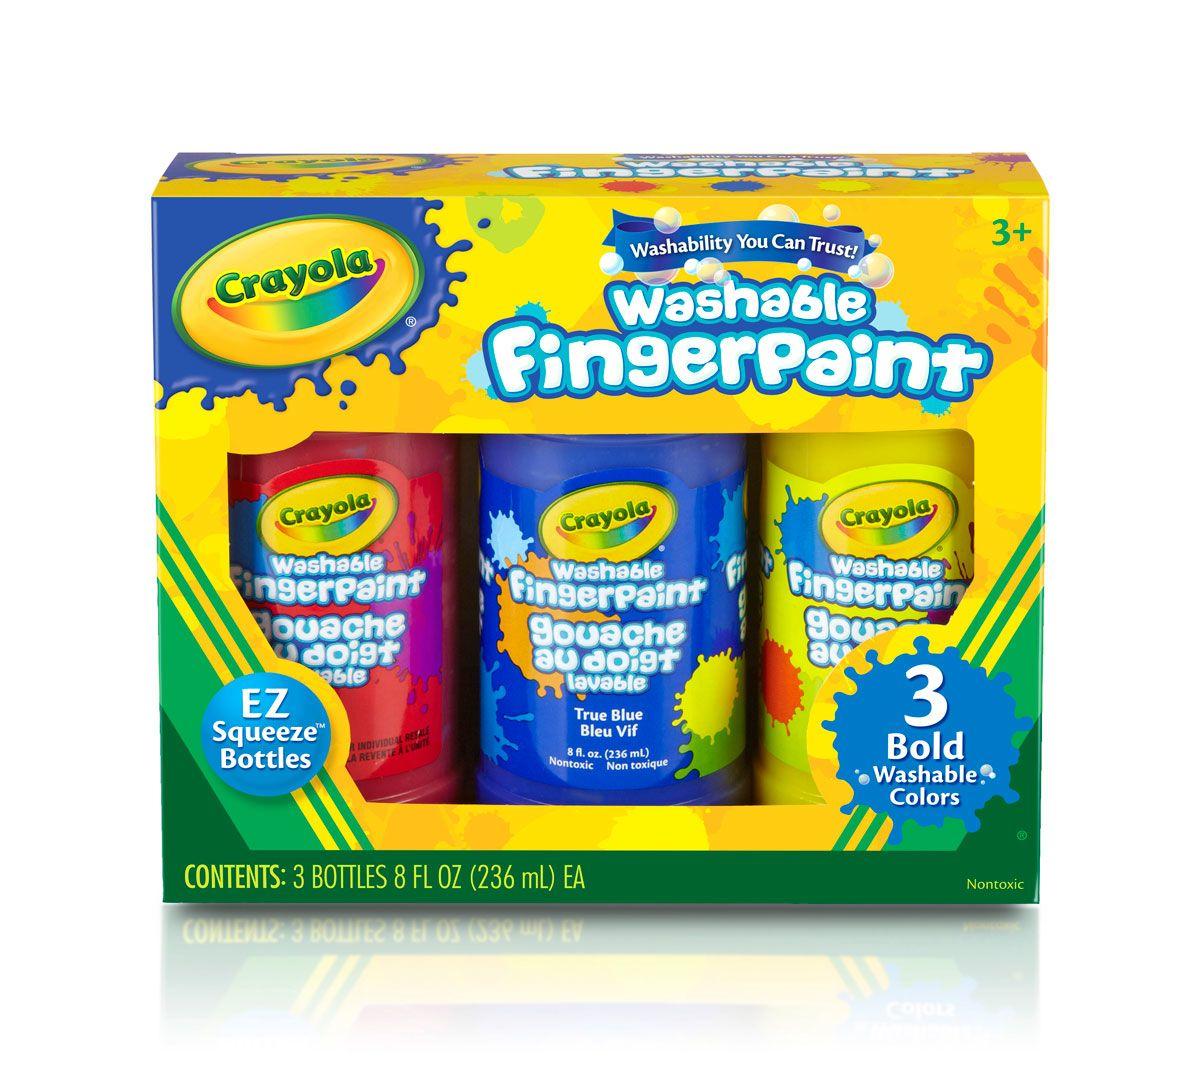 Crayola Washable Finger Paint 8oz: Primary สีระบายด้วยนิ้ว 3 สี (แดง น้ำเงิน เหลือง)